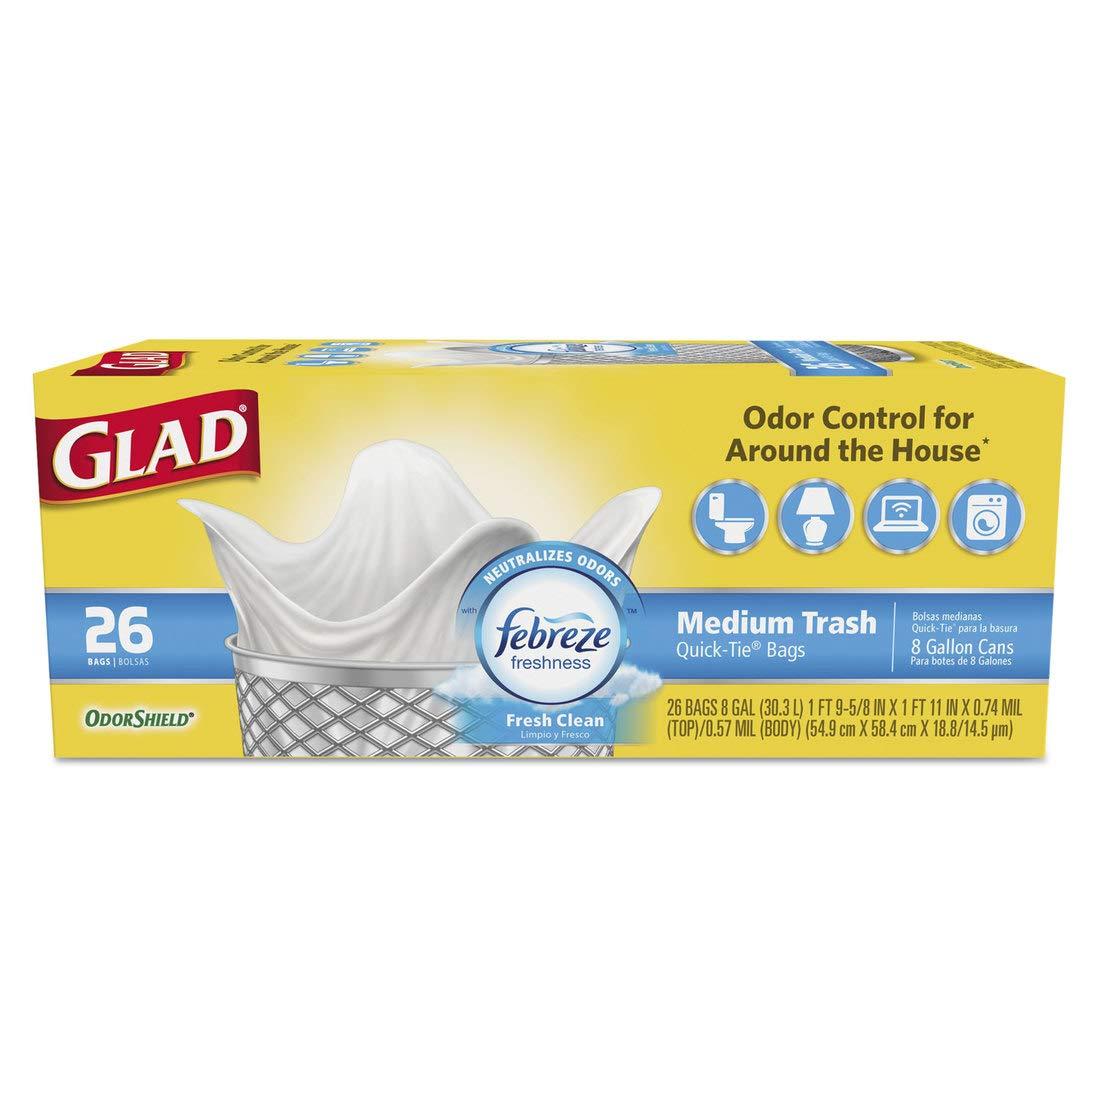 OdorShield QuickTie Medium Trash Bags, Fresh Clean.57mil, 8gal, 26/BX, 6 BX/CT by Glad